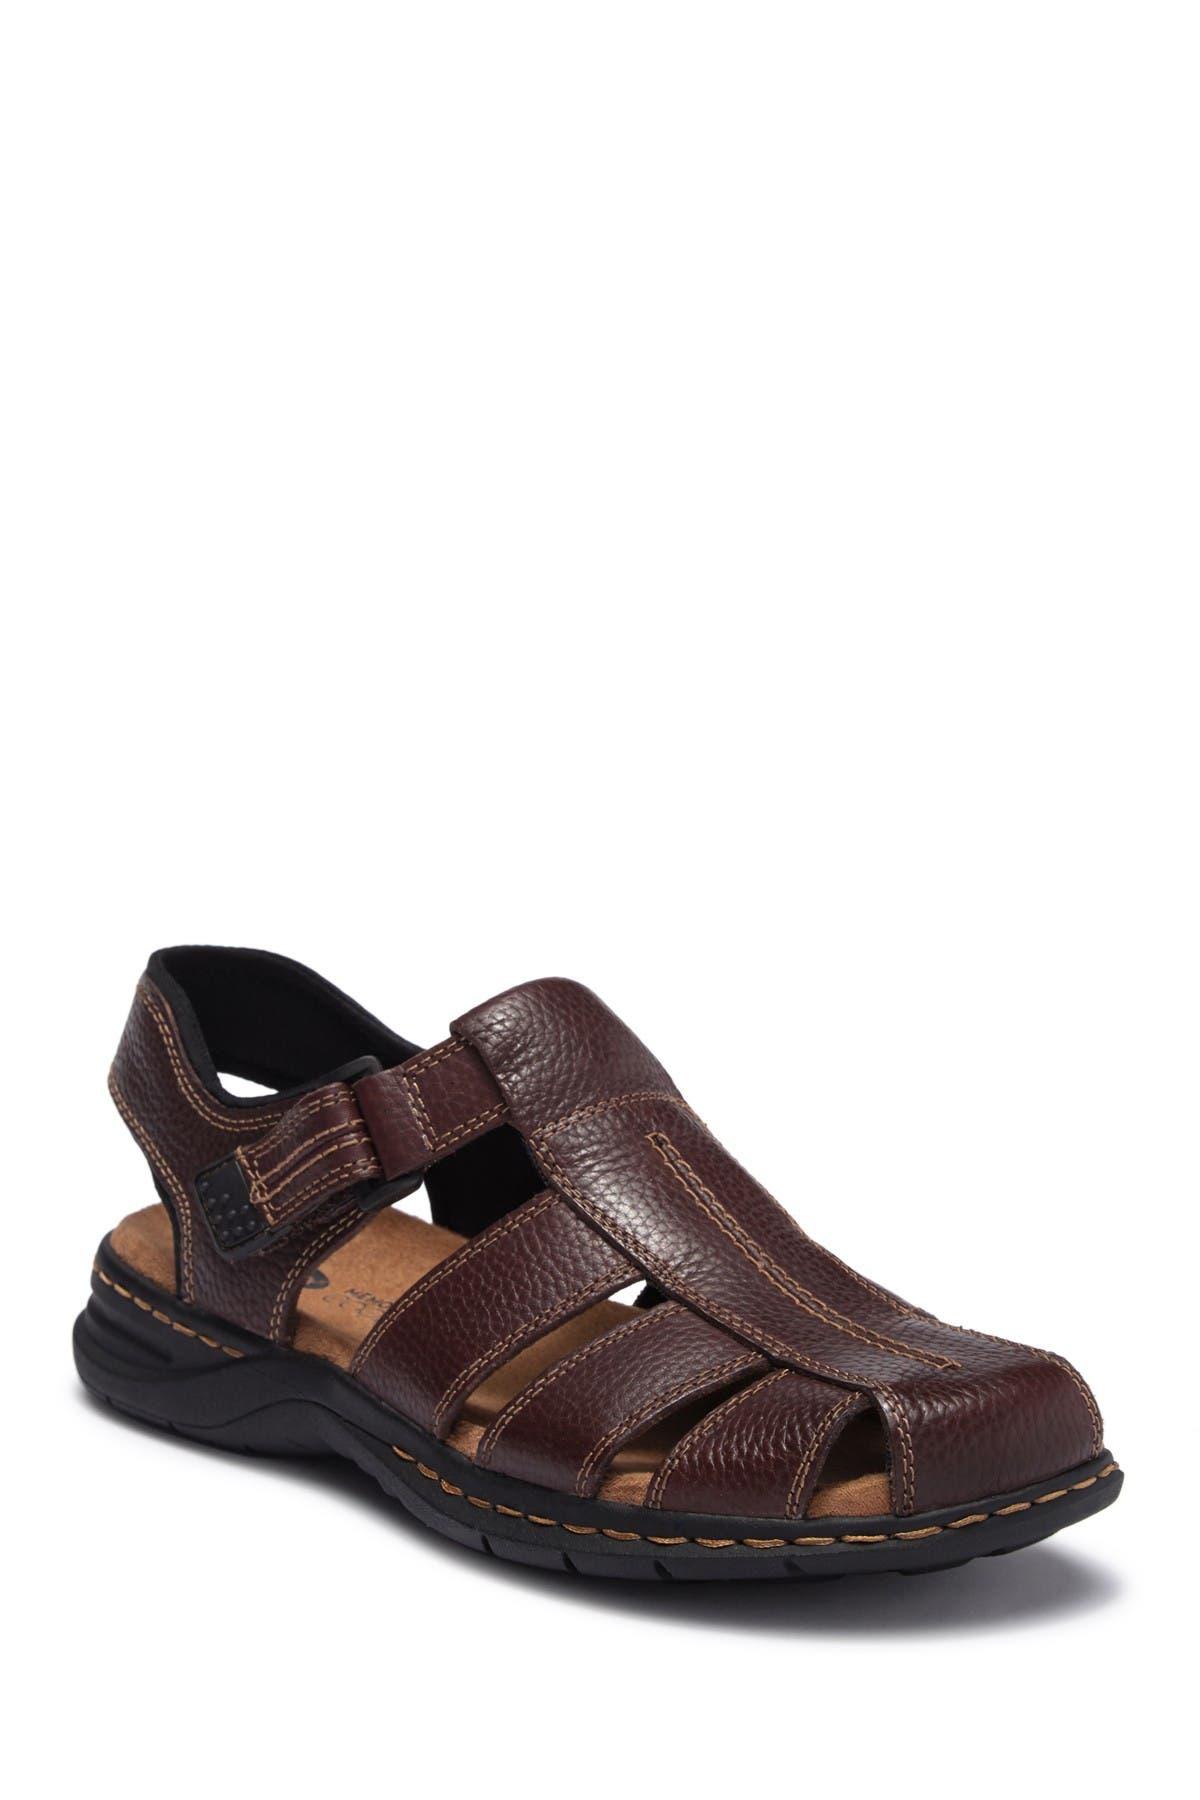 Gaston Leather Sandal   Nordstrom Rack